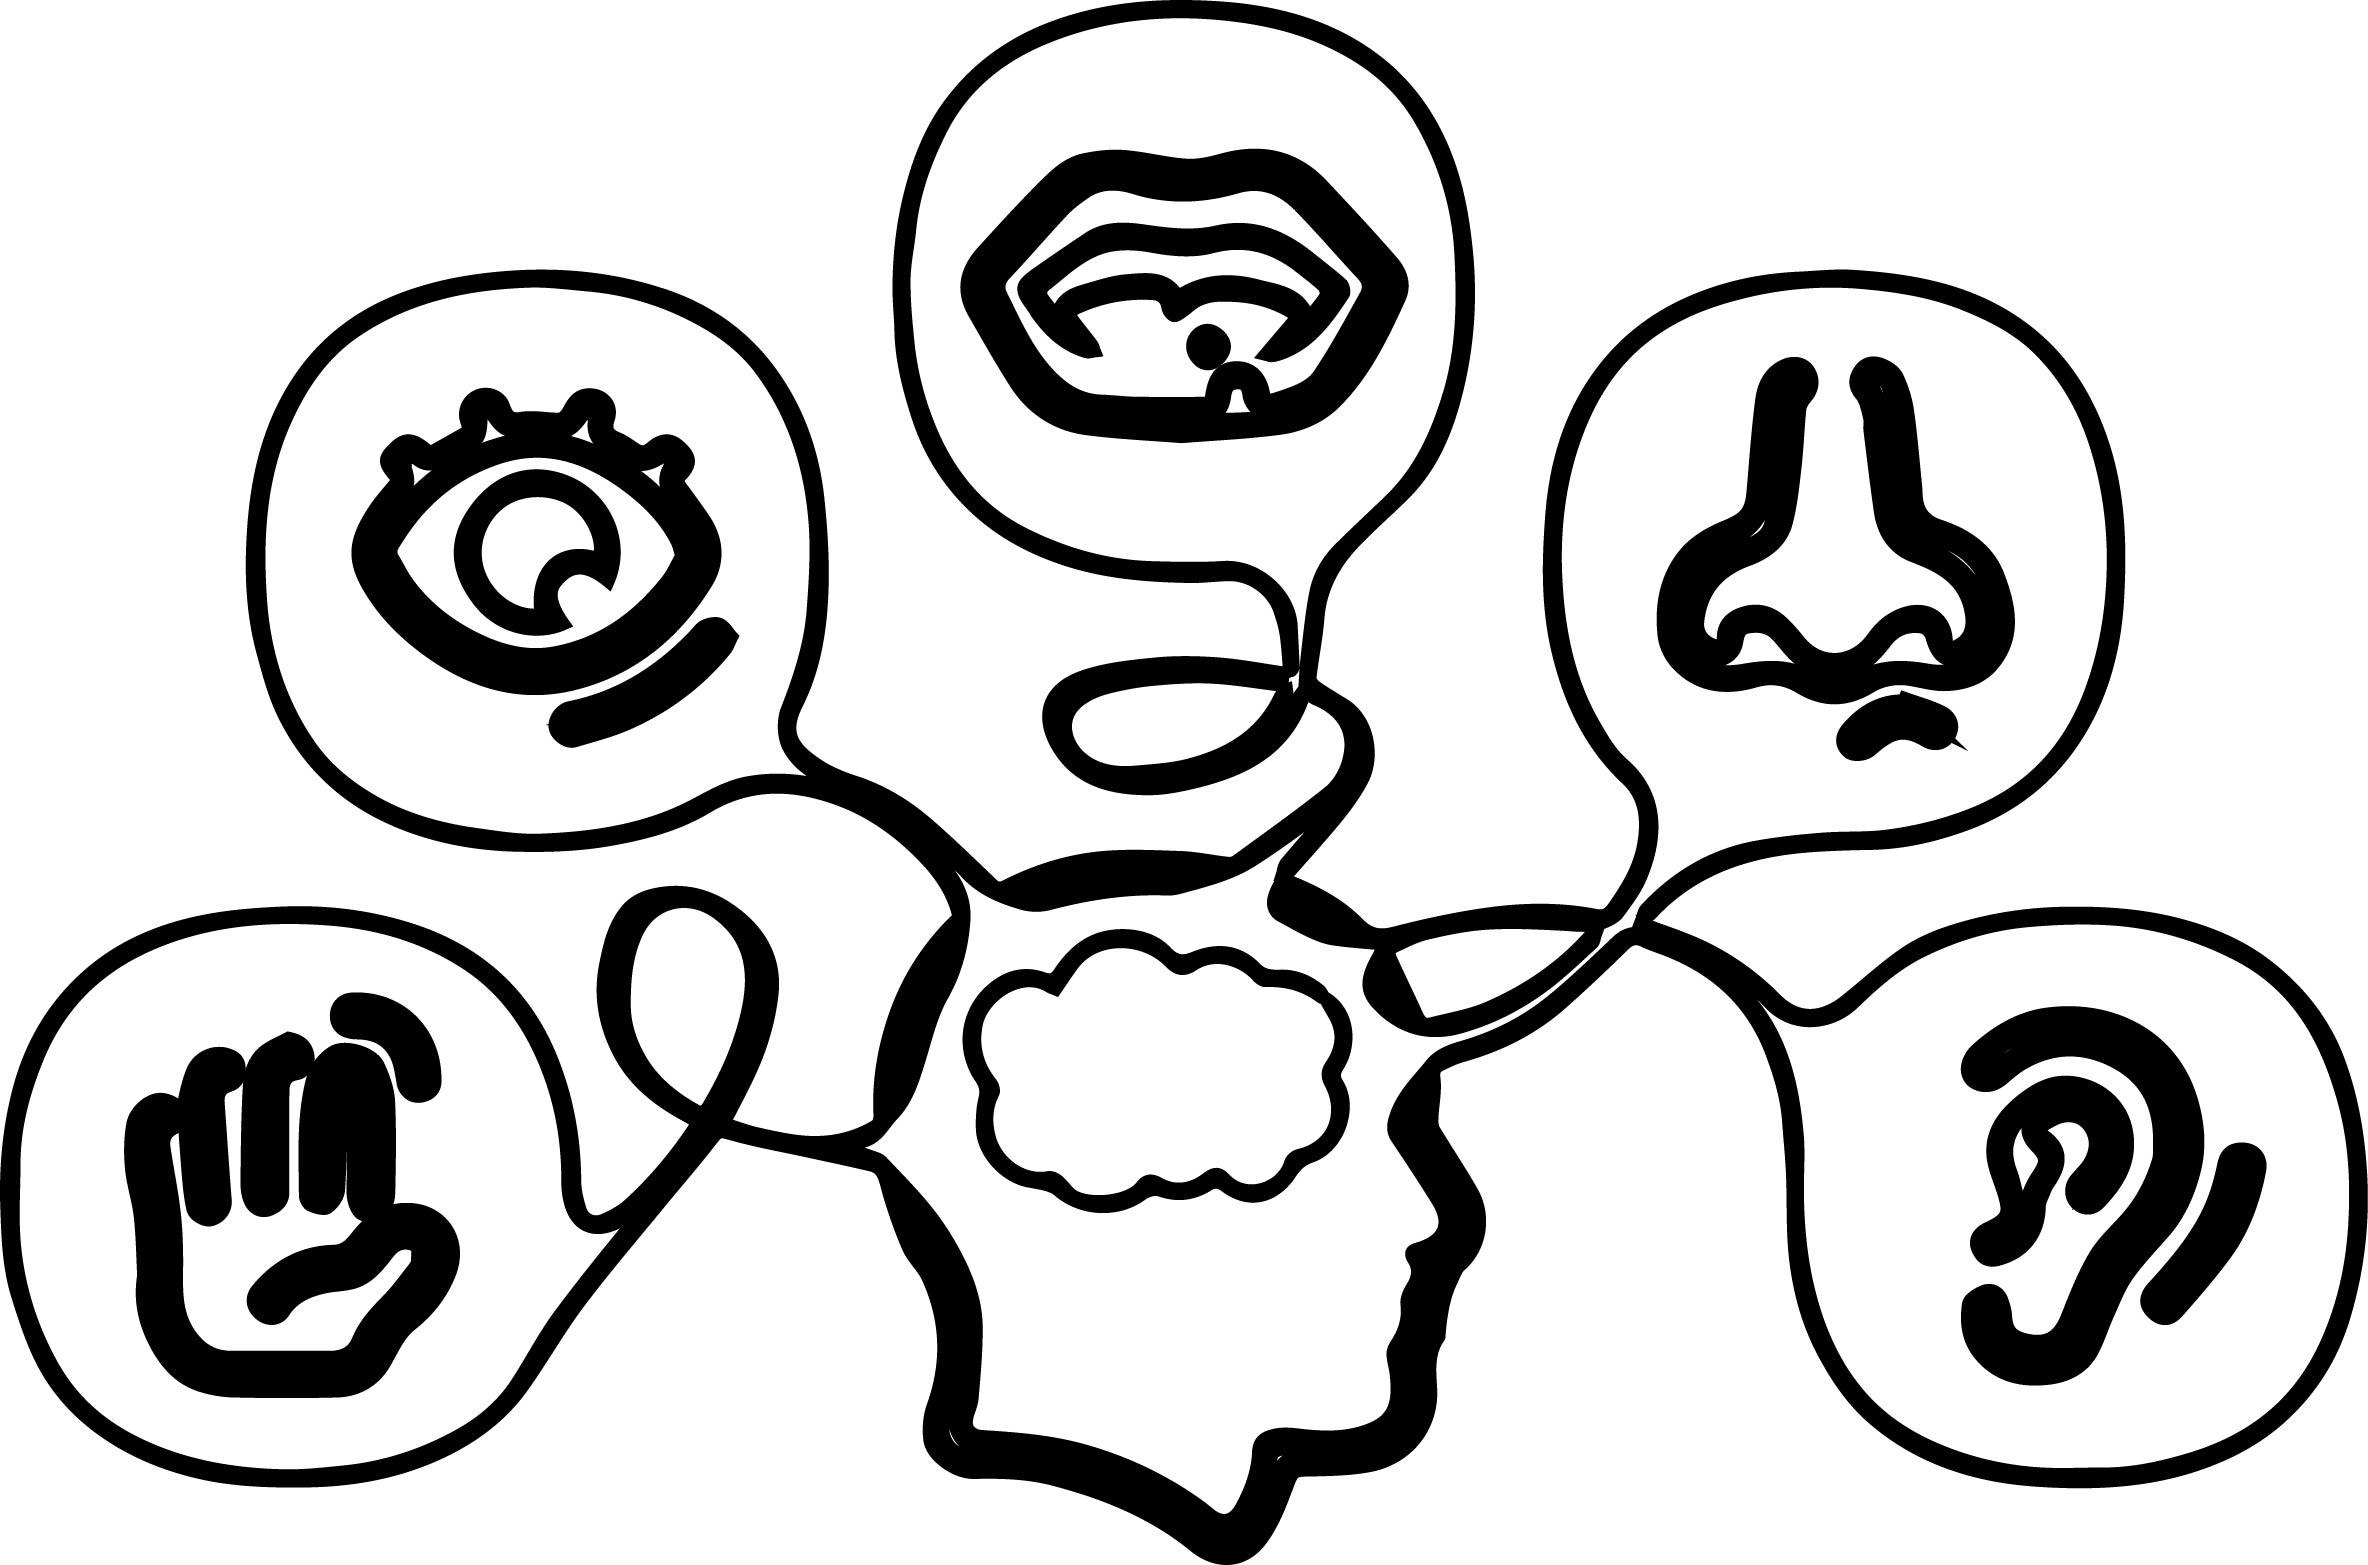 5 Senses Coloring Pages